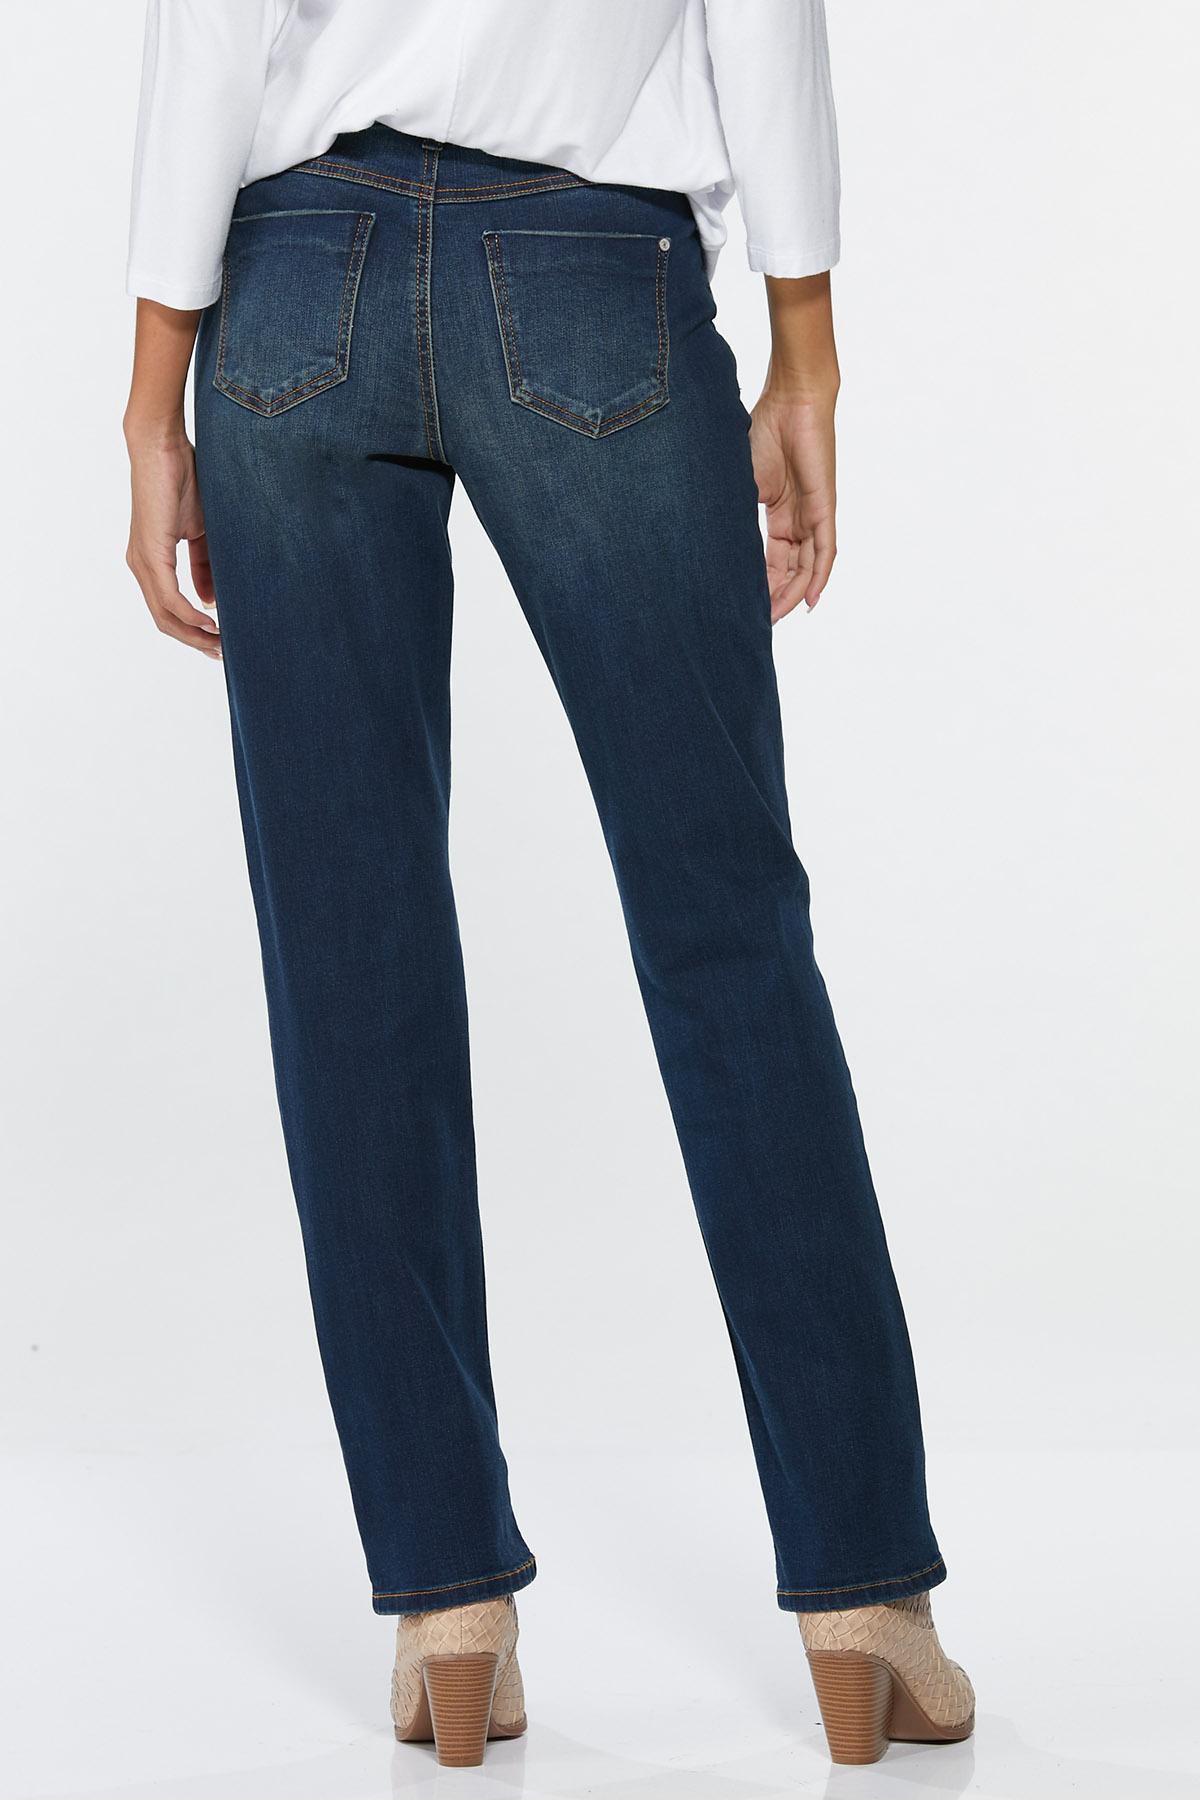 Curvy Straight Leg Jeans (Item #44693641)